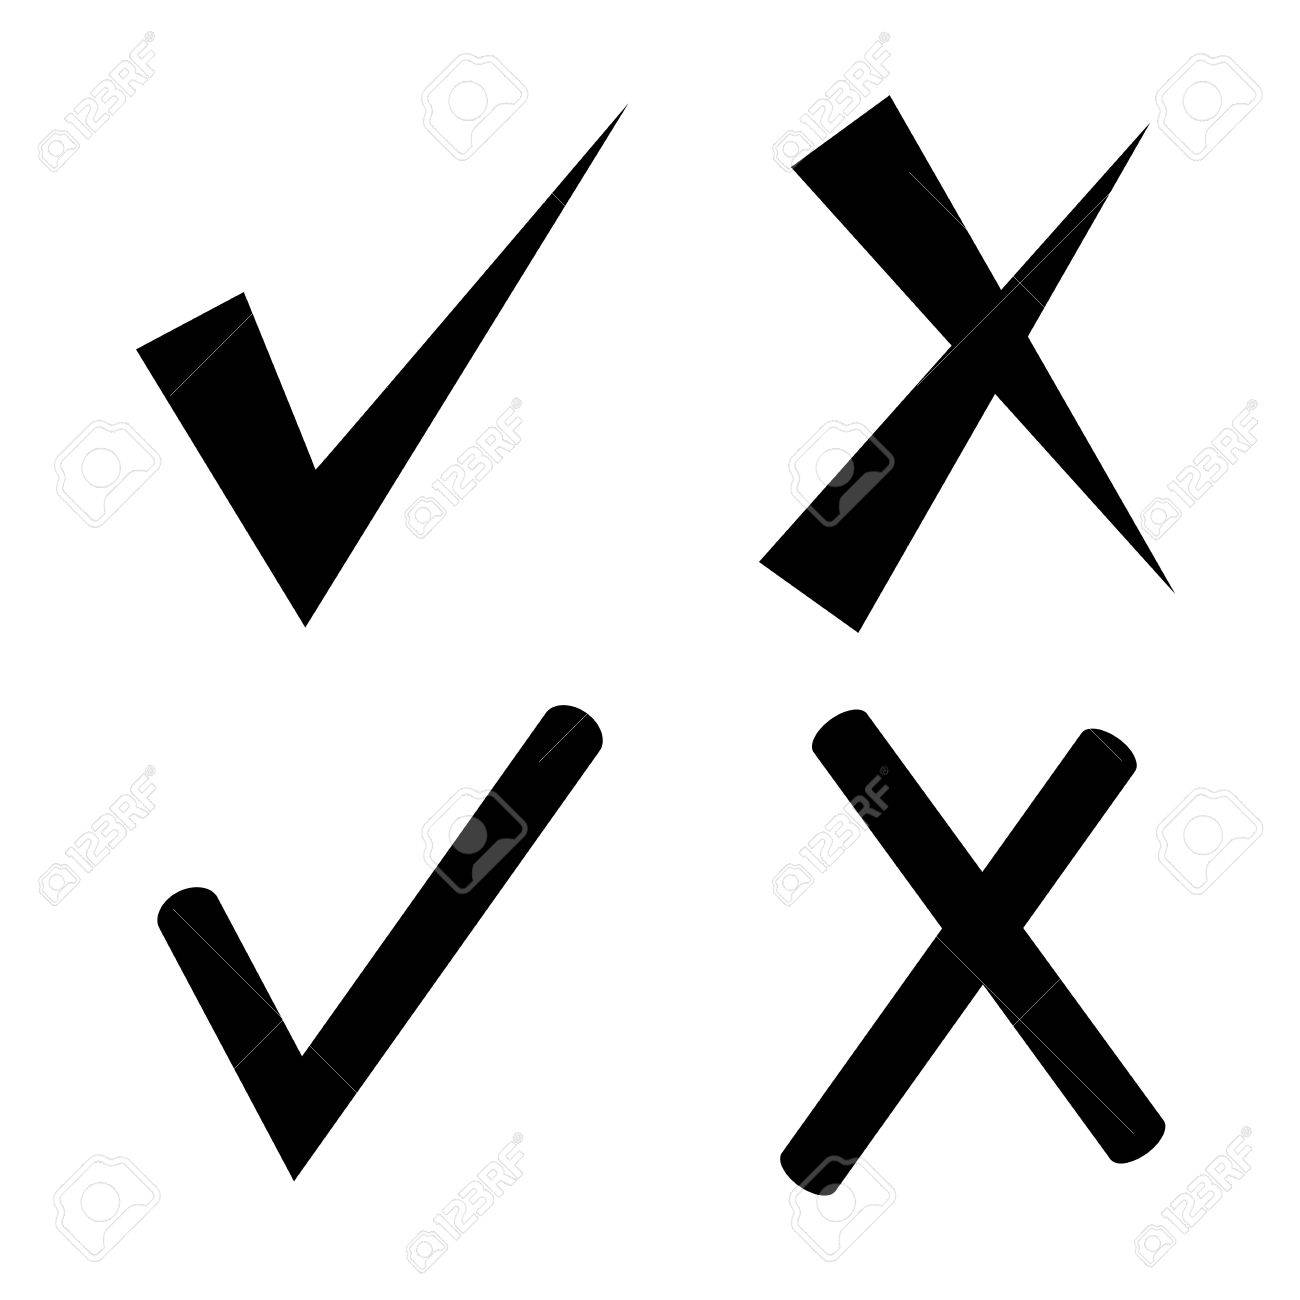 check mark and wrong mark